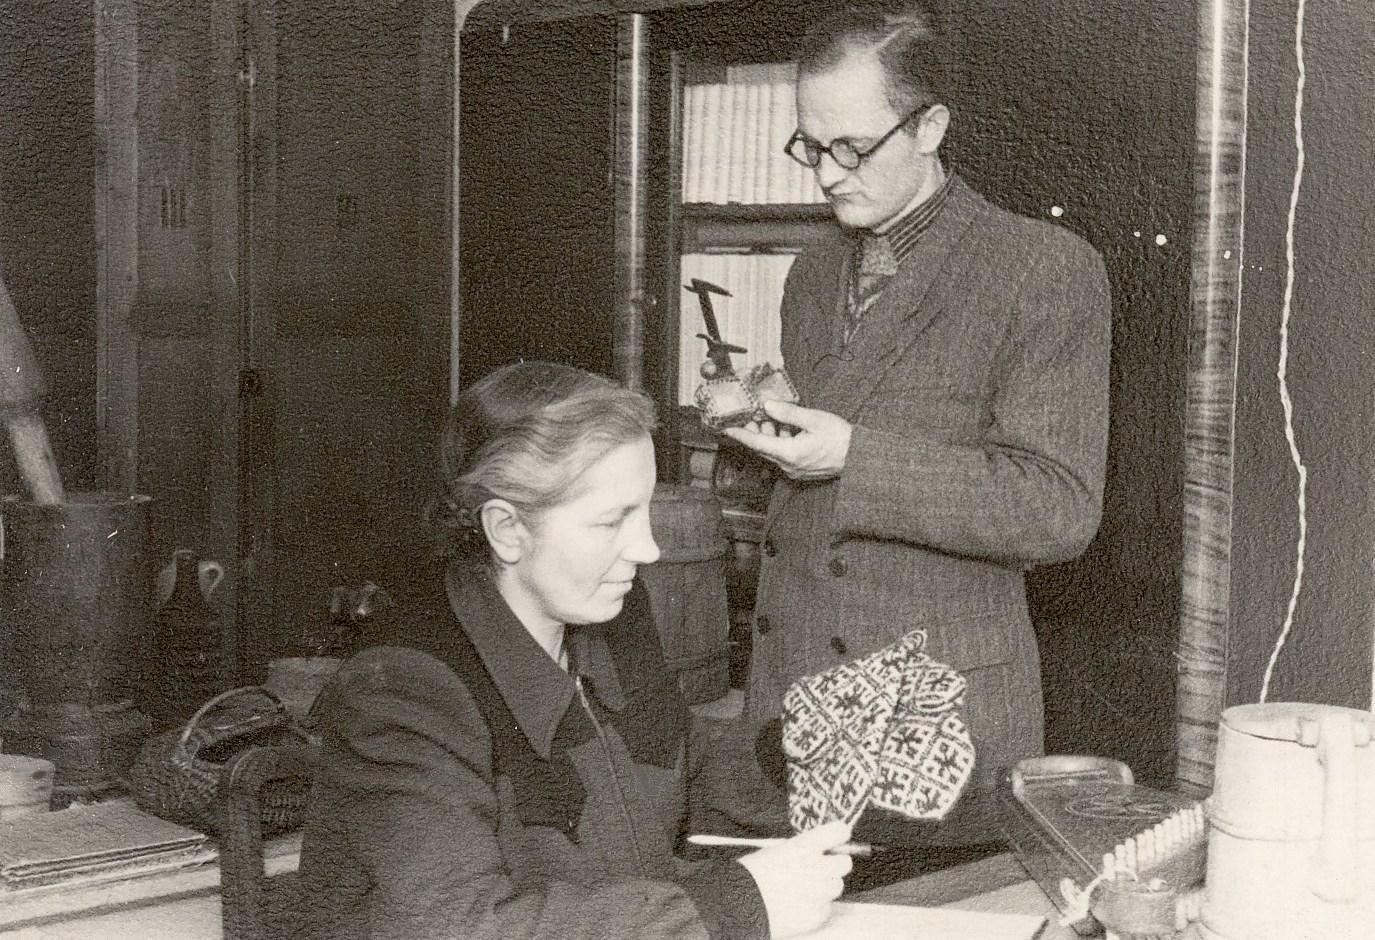 Elza Rudenāja and Vladislavs Urtāns, February 1953.MNMZarh.1048